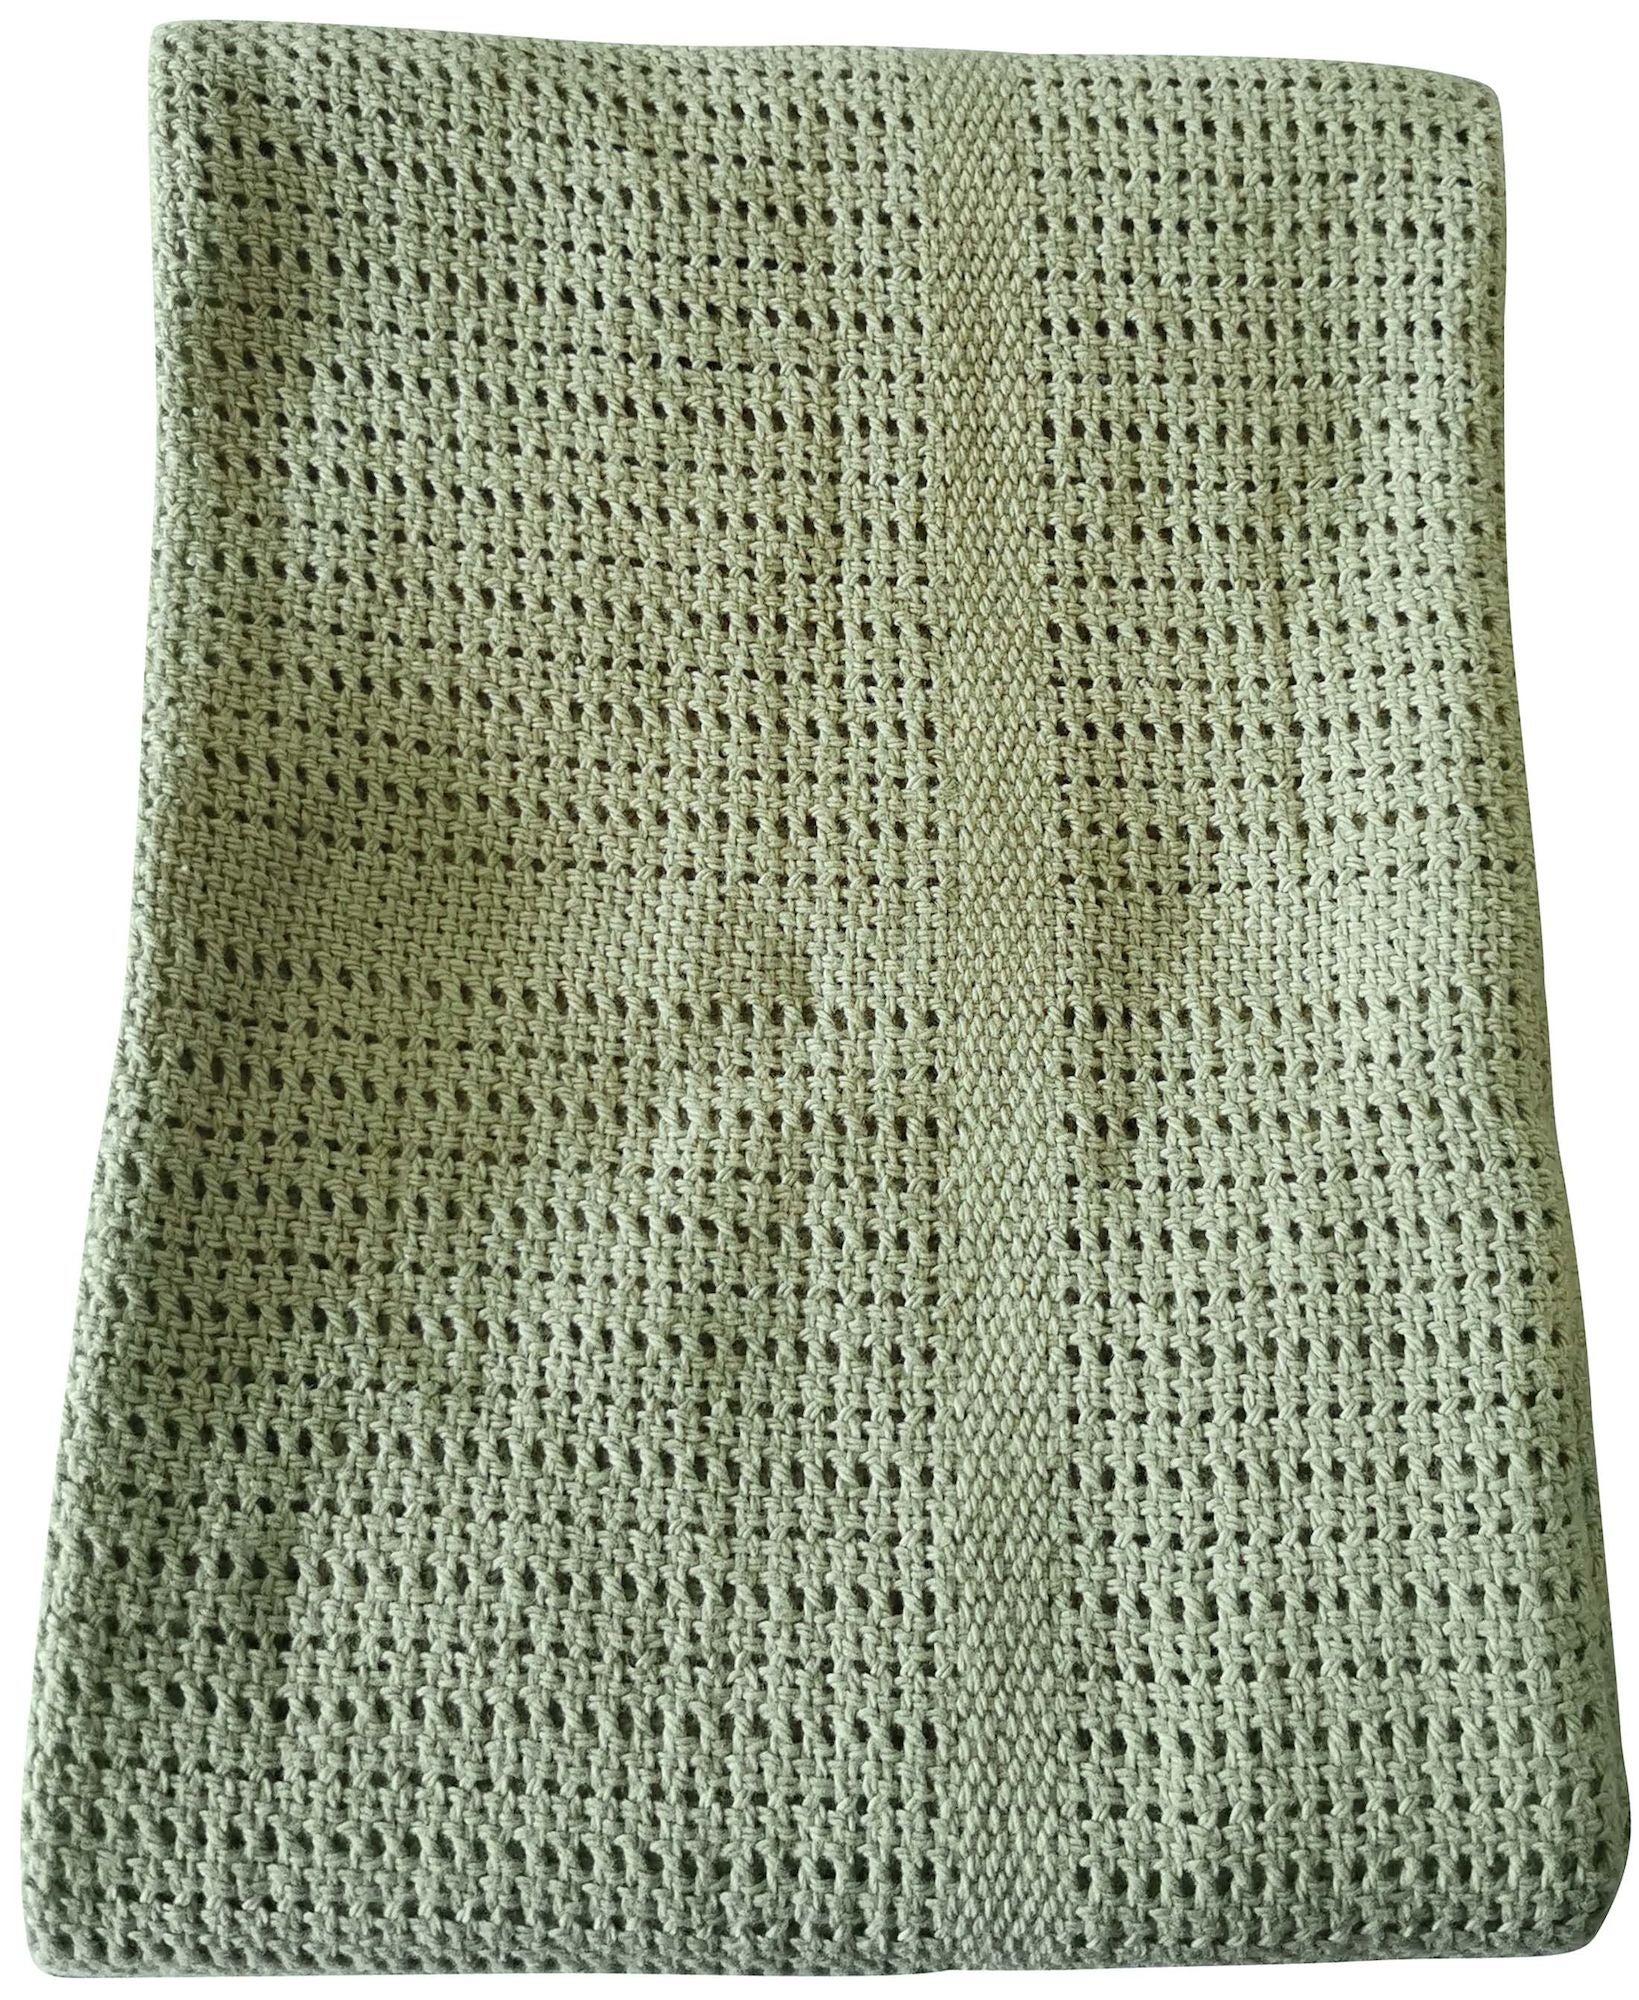 BabyDan Cotton Blanket Viltti, Dusty Green